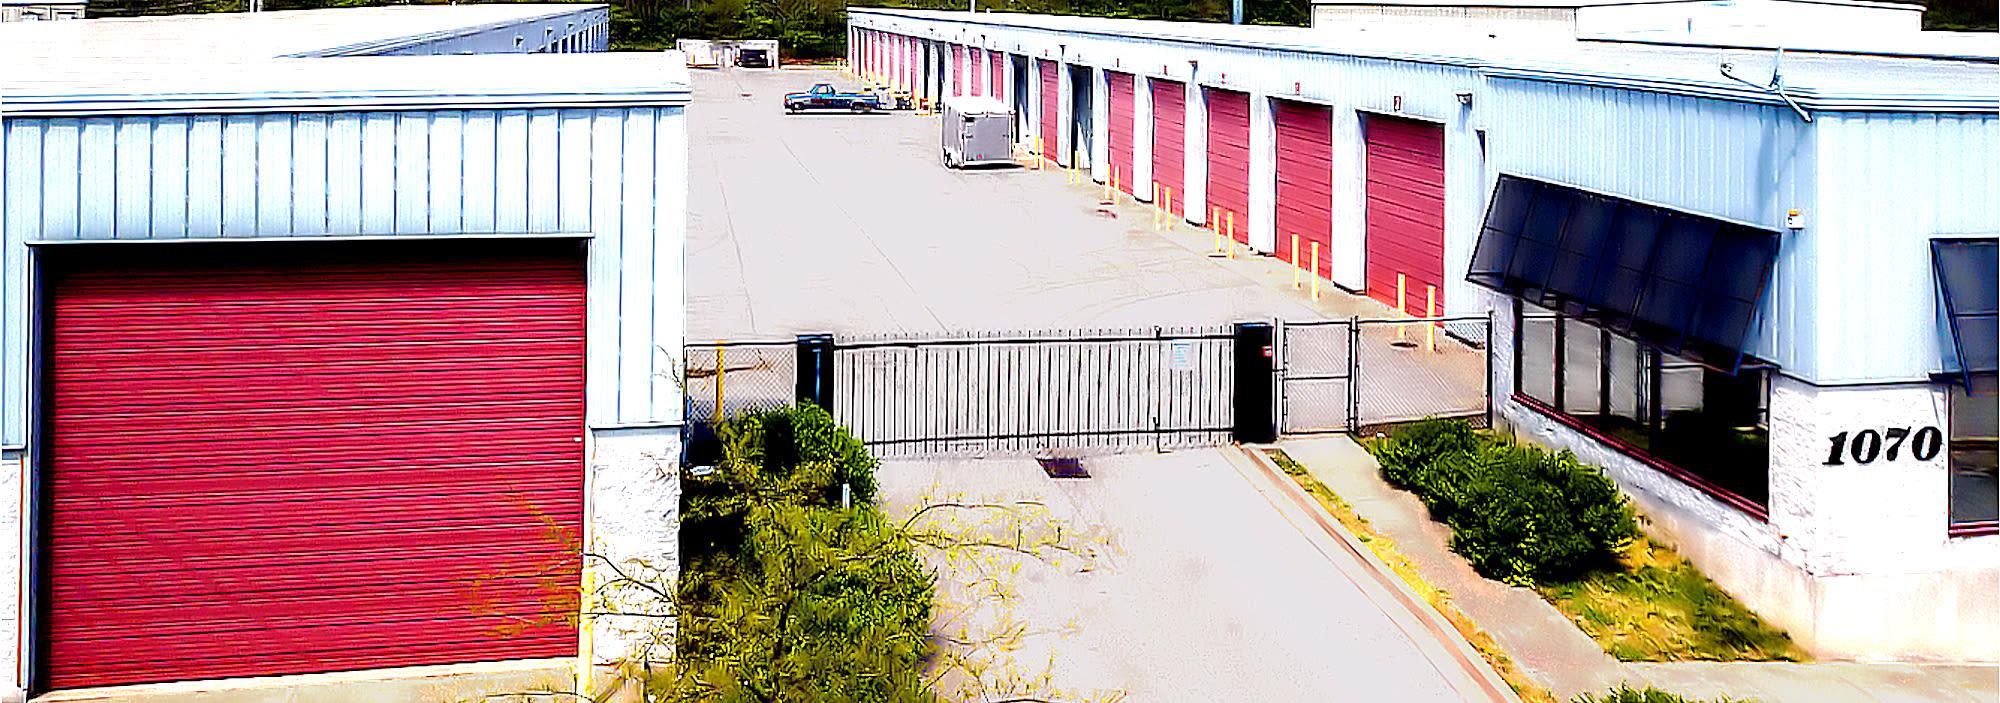 Prime Storage In Nicholasville, KY